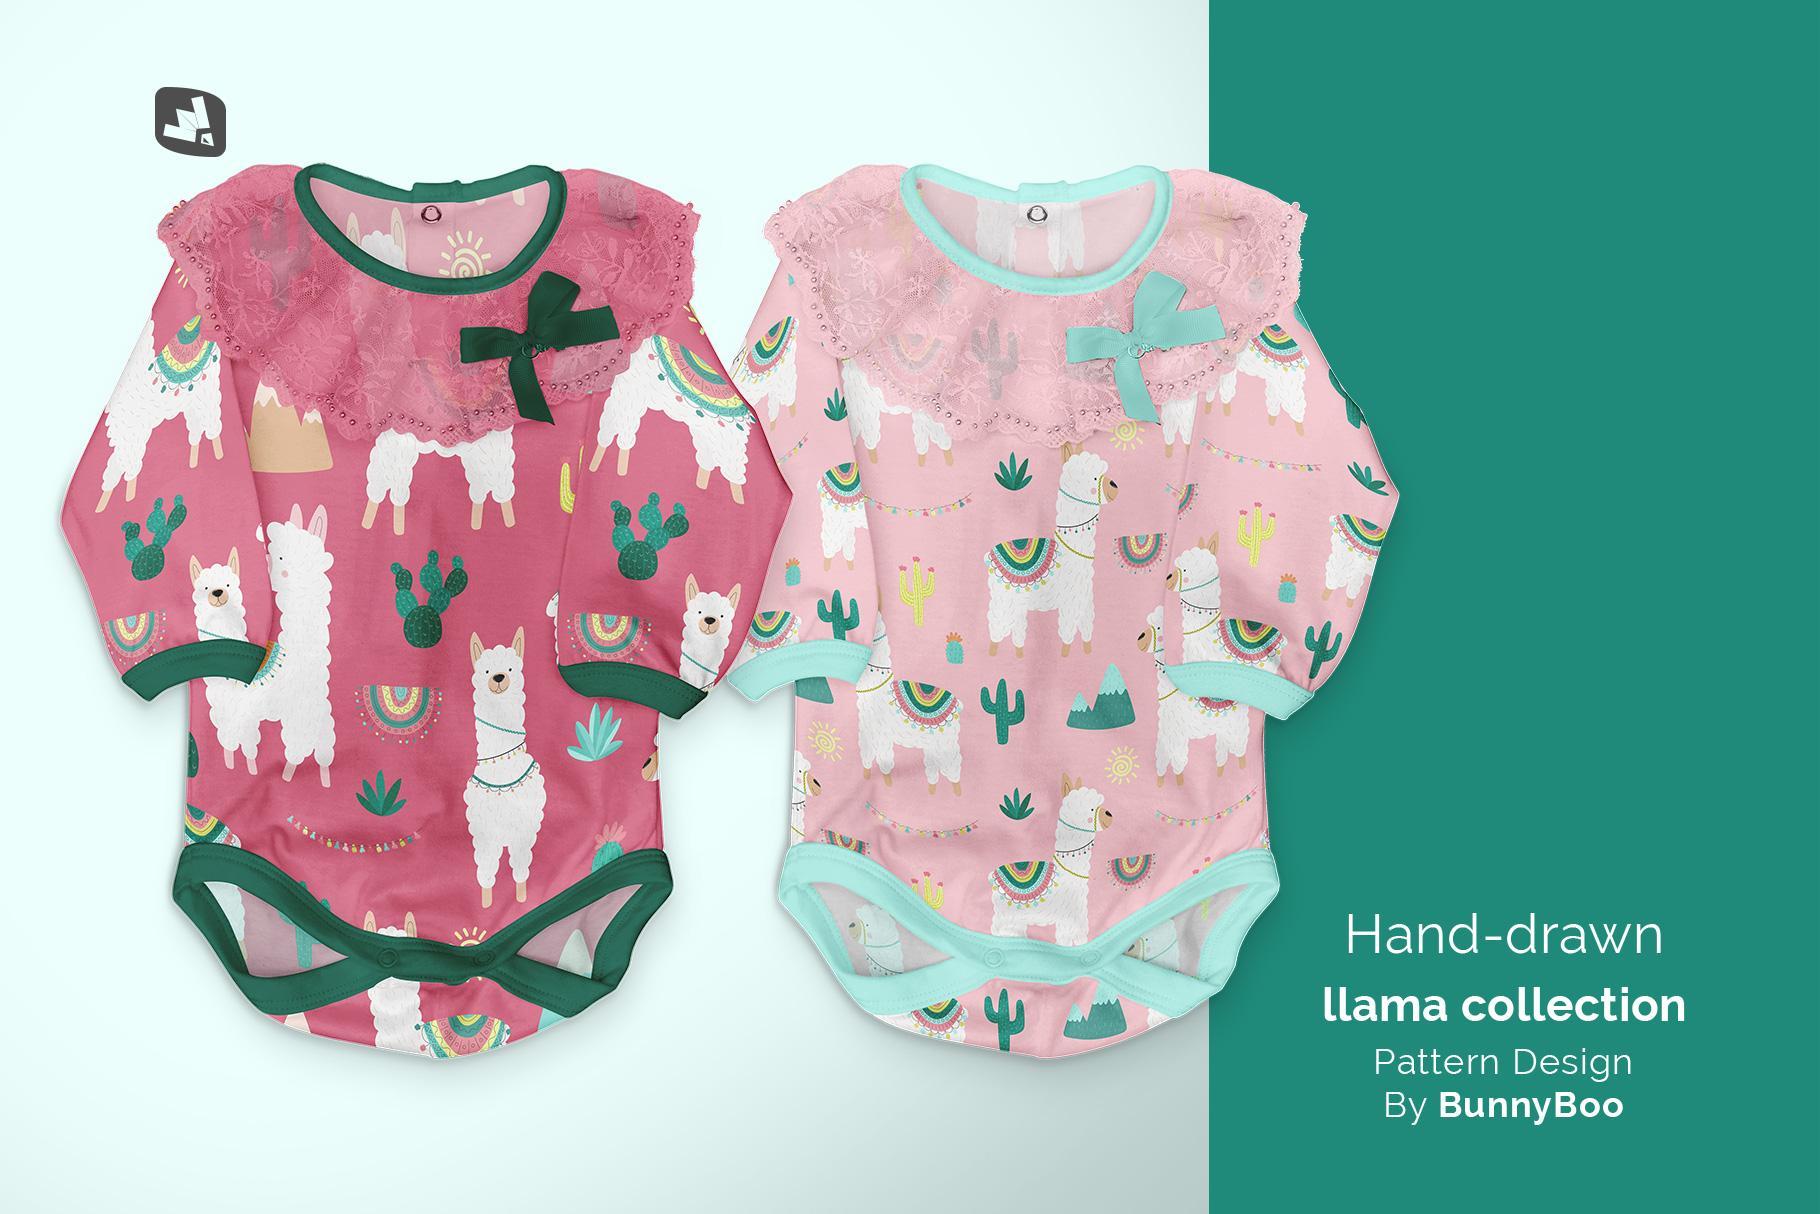 designer's credit of the baby girl's onesie mockup